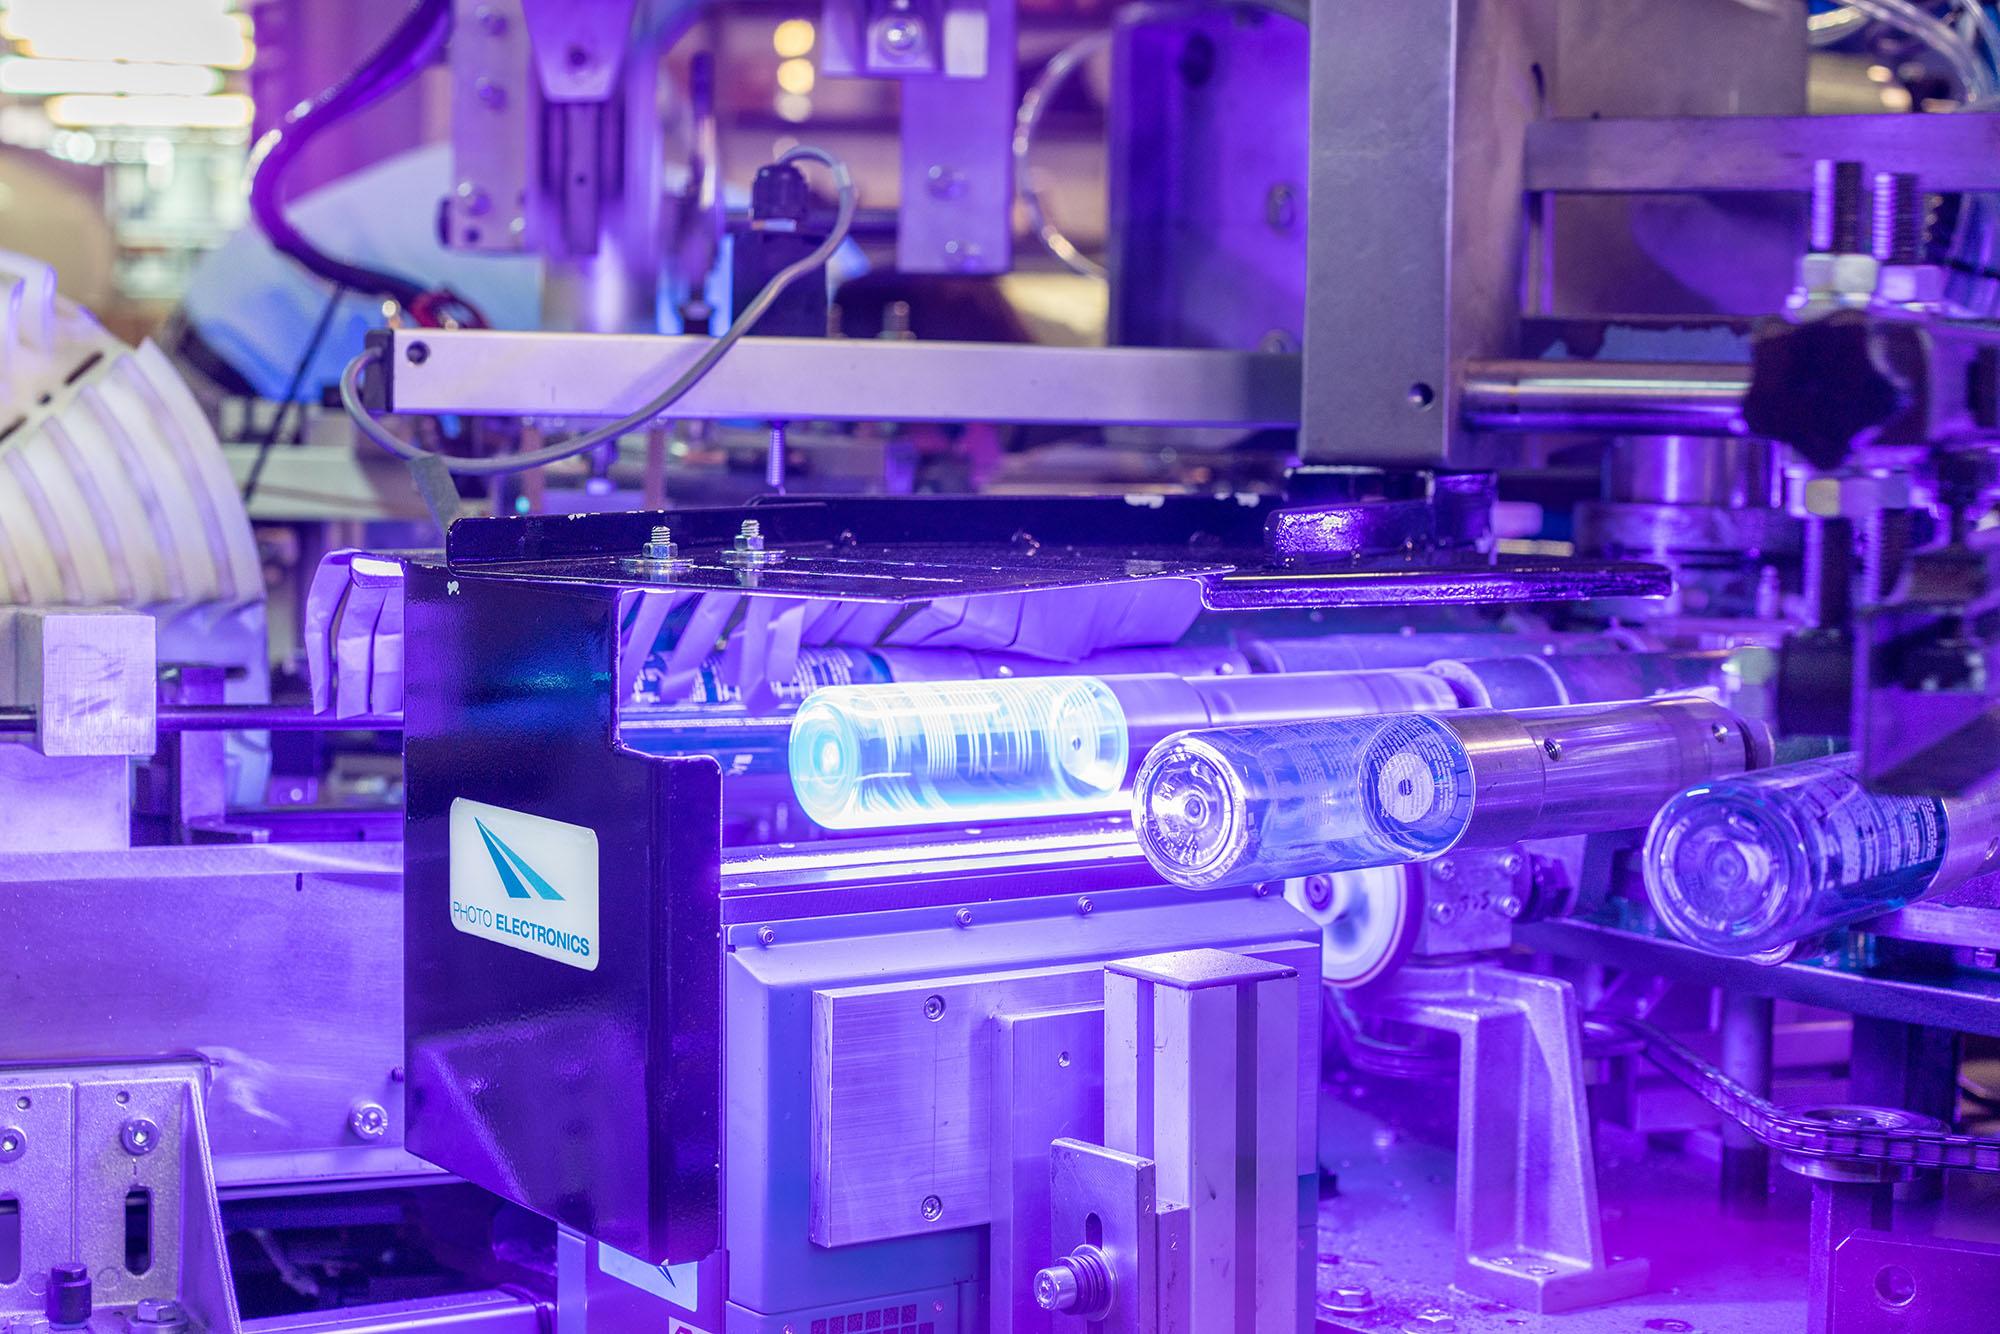 Production of new generation UV LED lamps